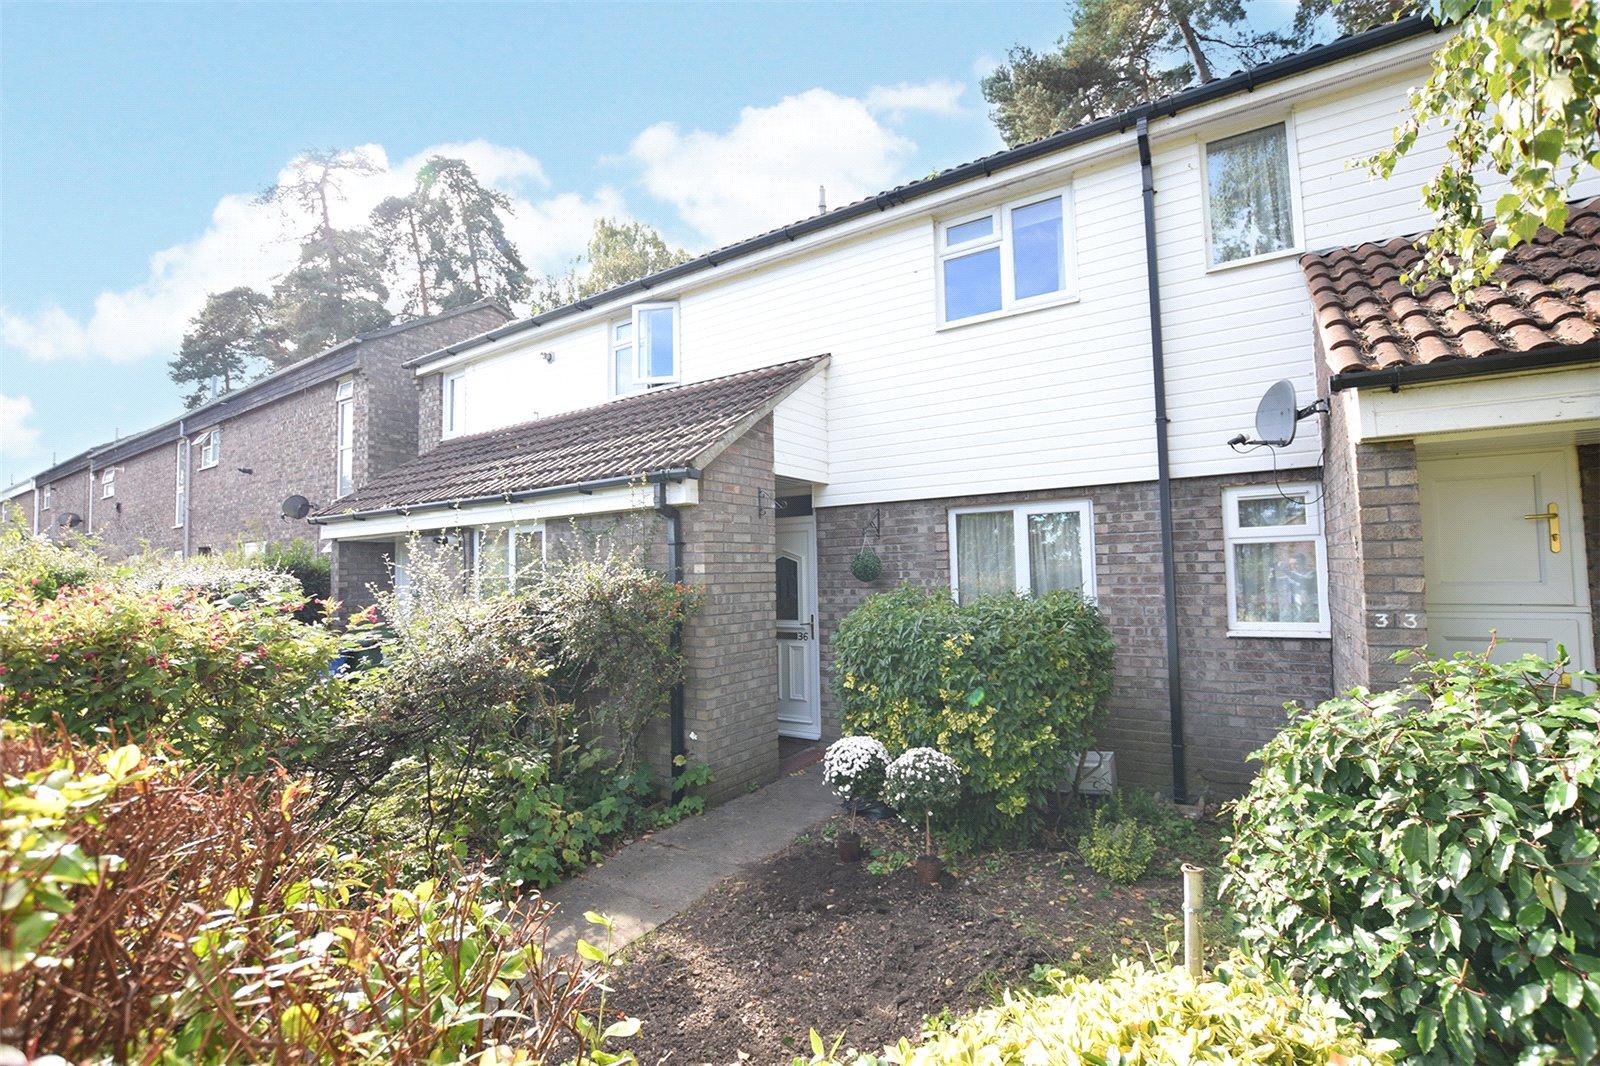 1 Bedroom Maisonette Flat for sale in Keepers Coombe, Crown Wood, Bracknell, Berkshire, RG12